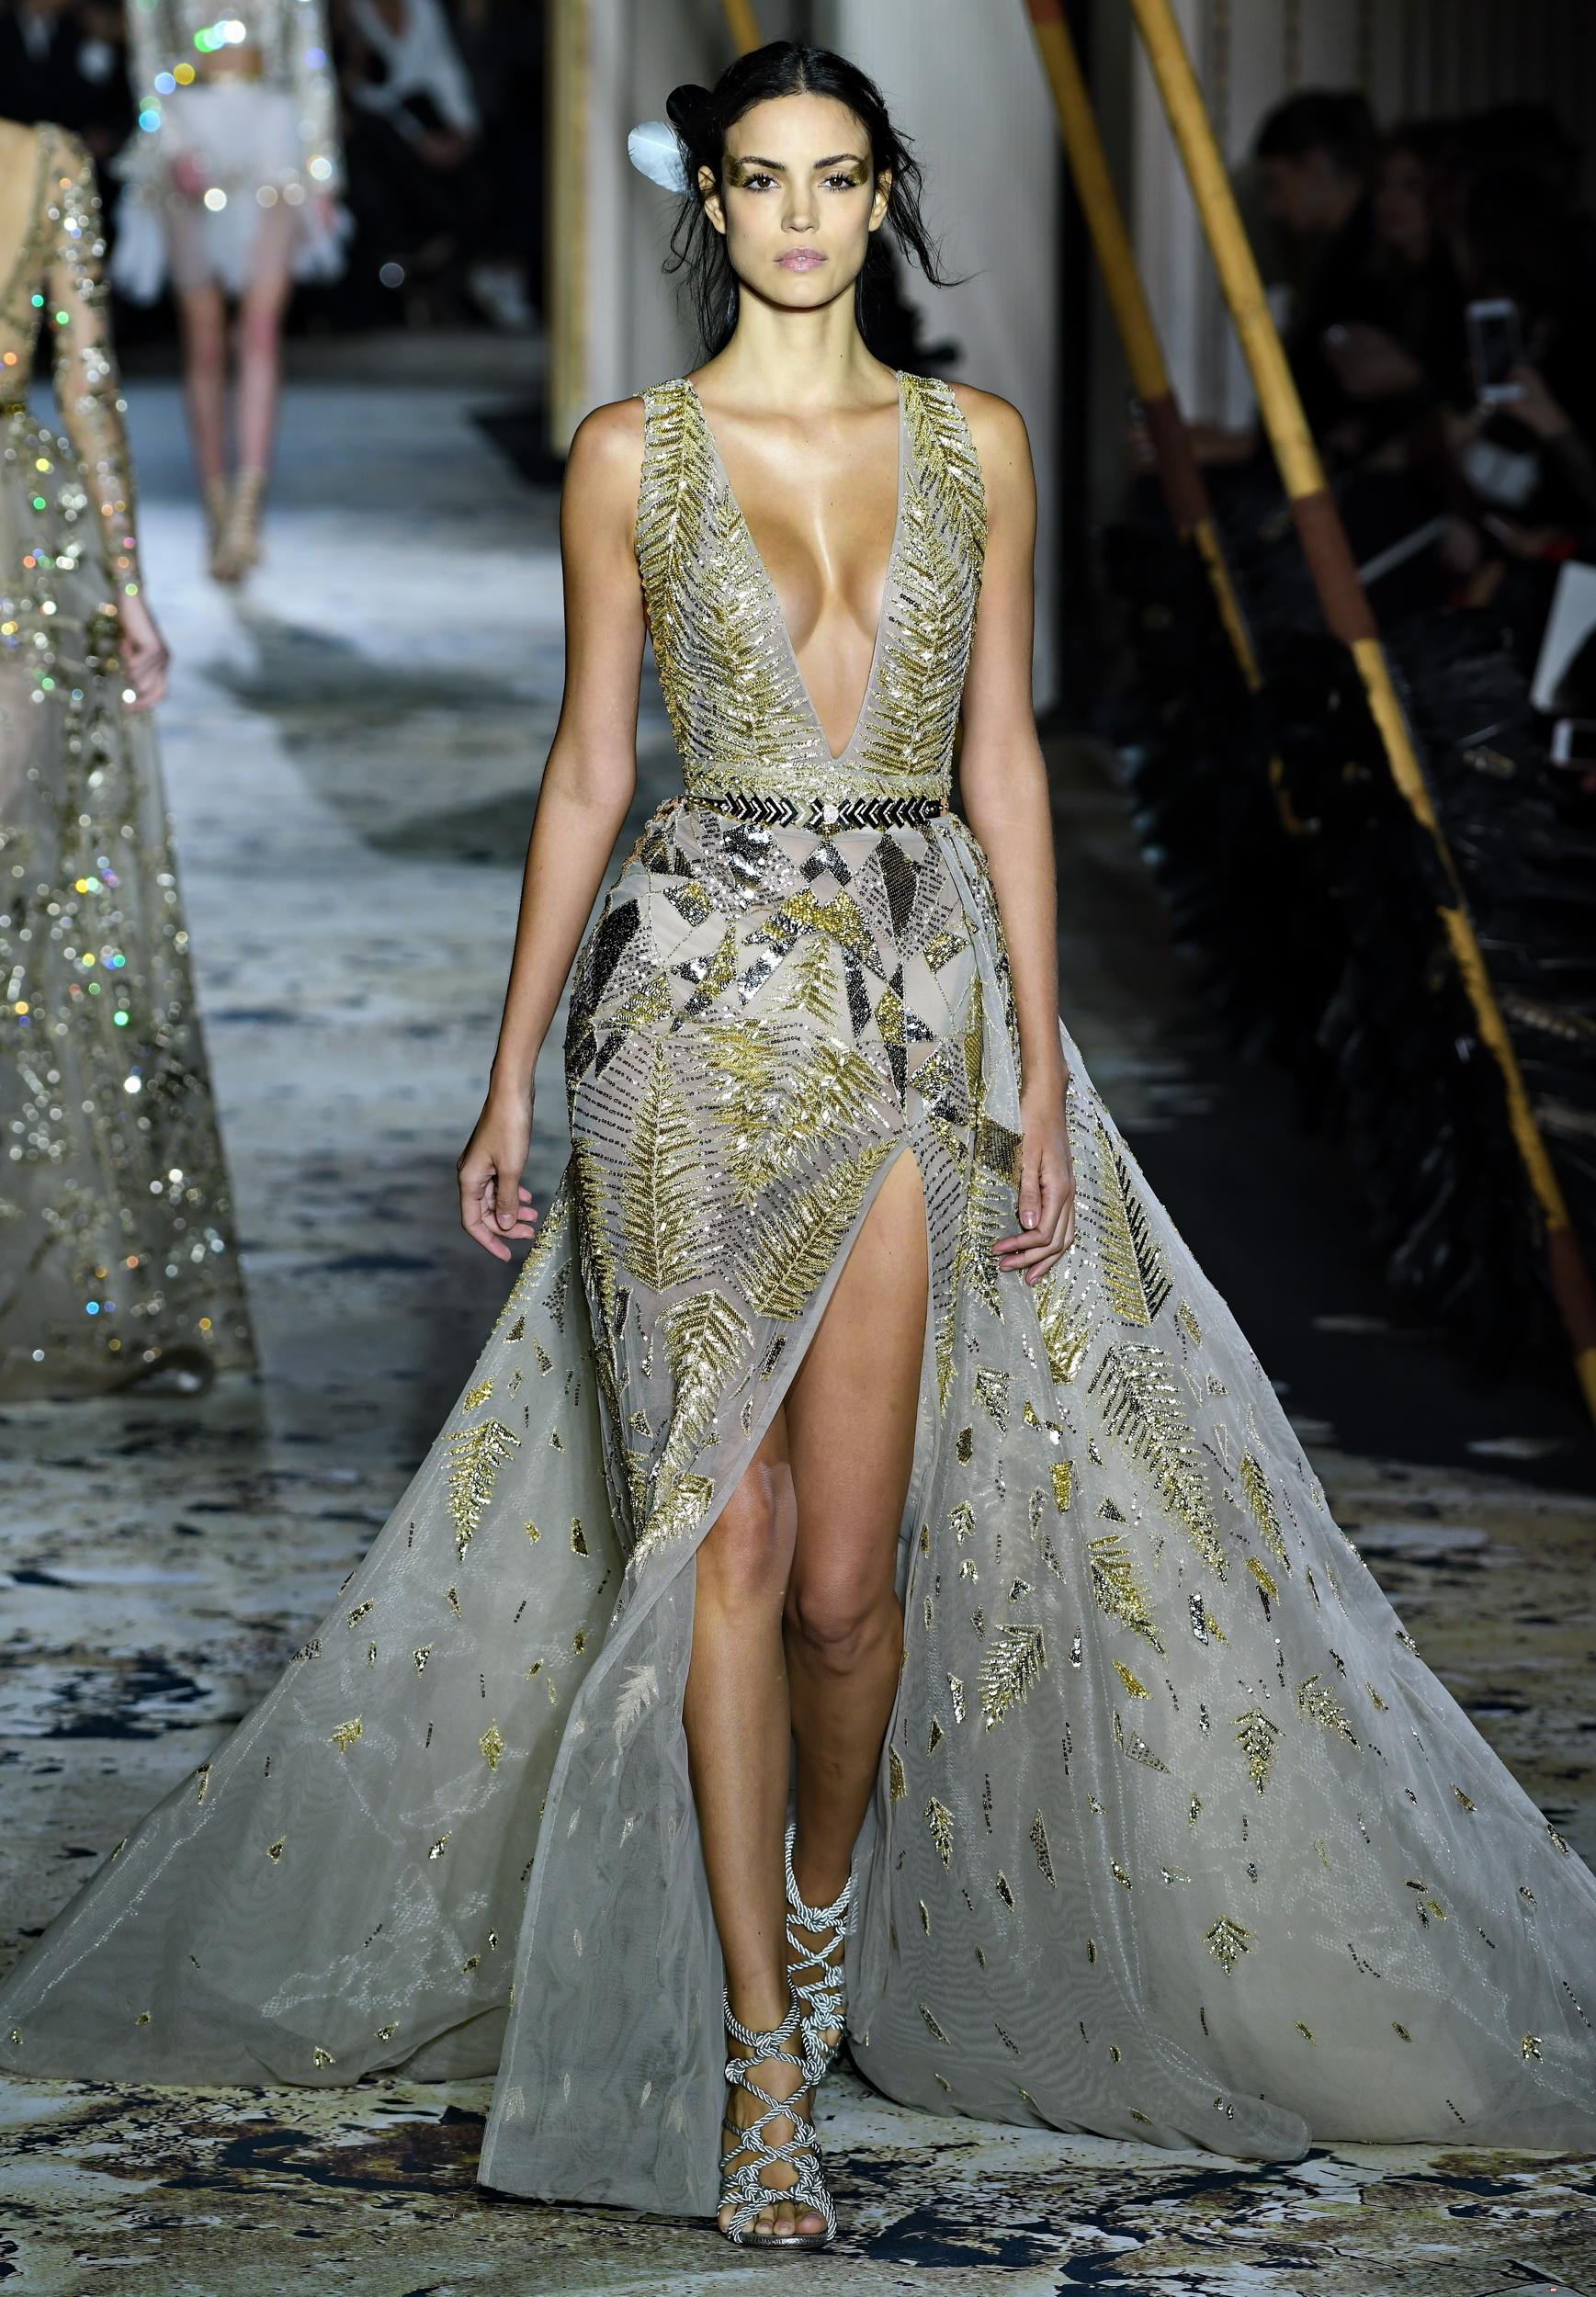 Paris Haute Couture SS 2018 Zuhair Murad 4to4u Arthur Koff 15.JPG